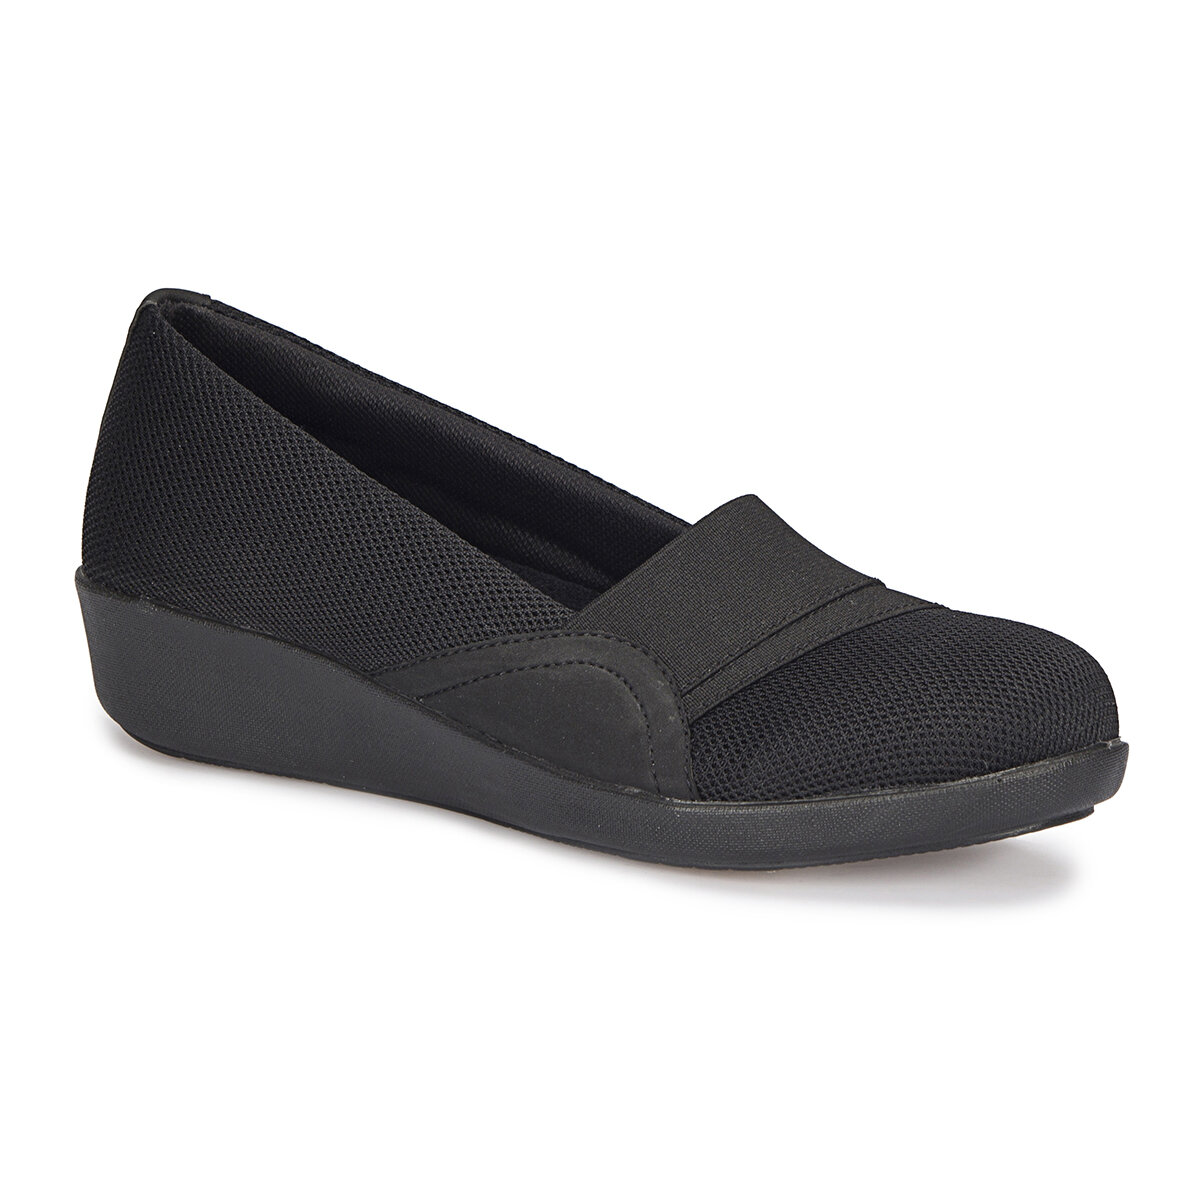 FLO 72.110026.Z Black Women Shoes Polaris